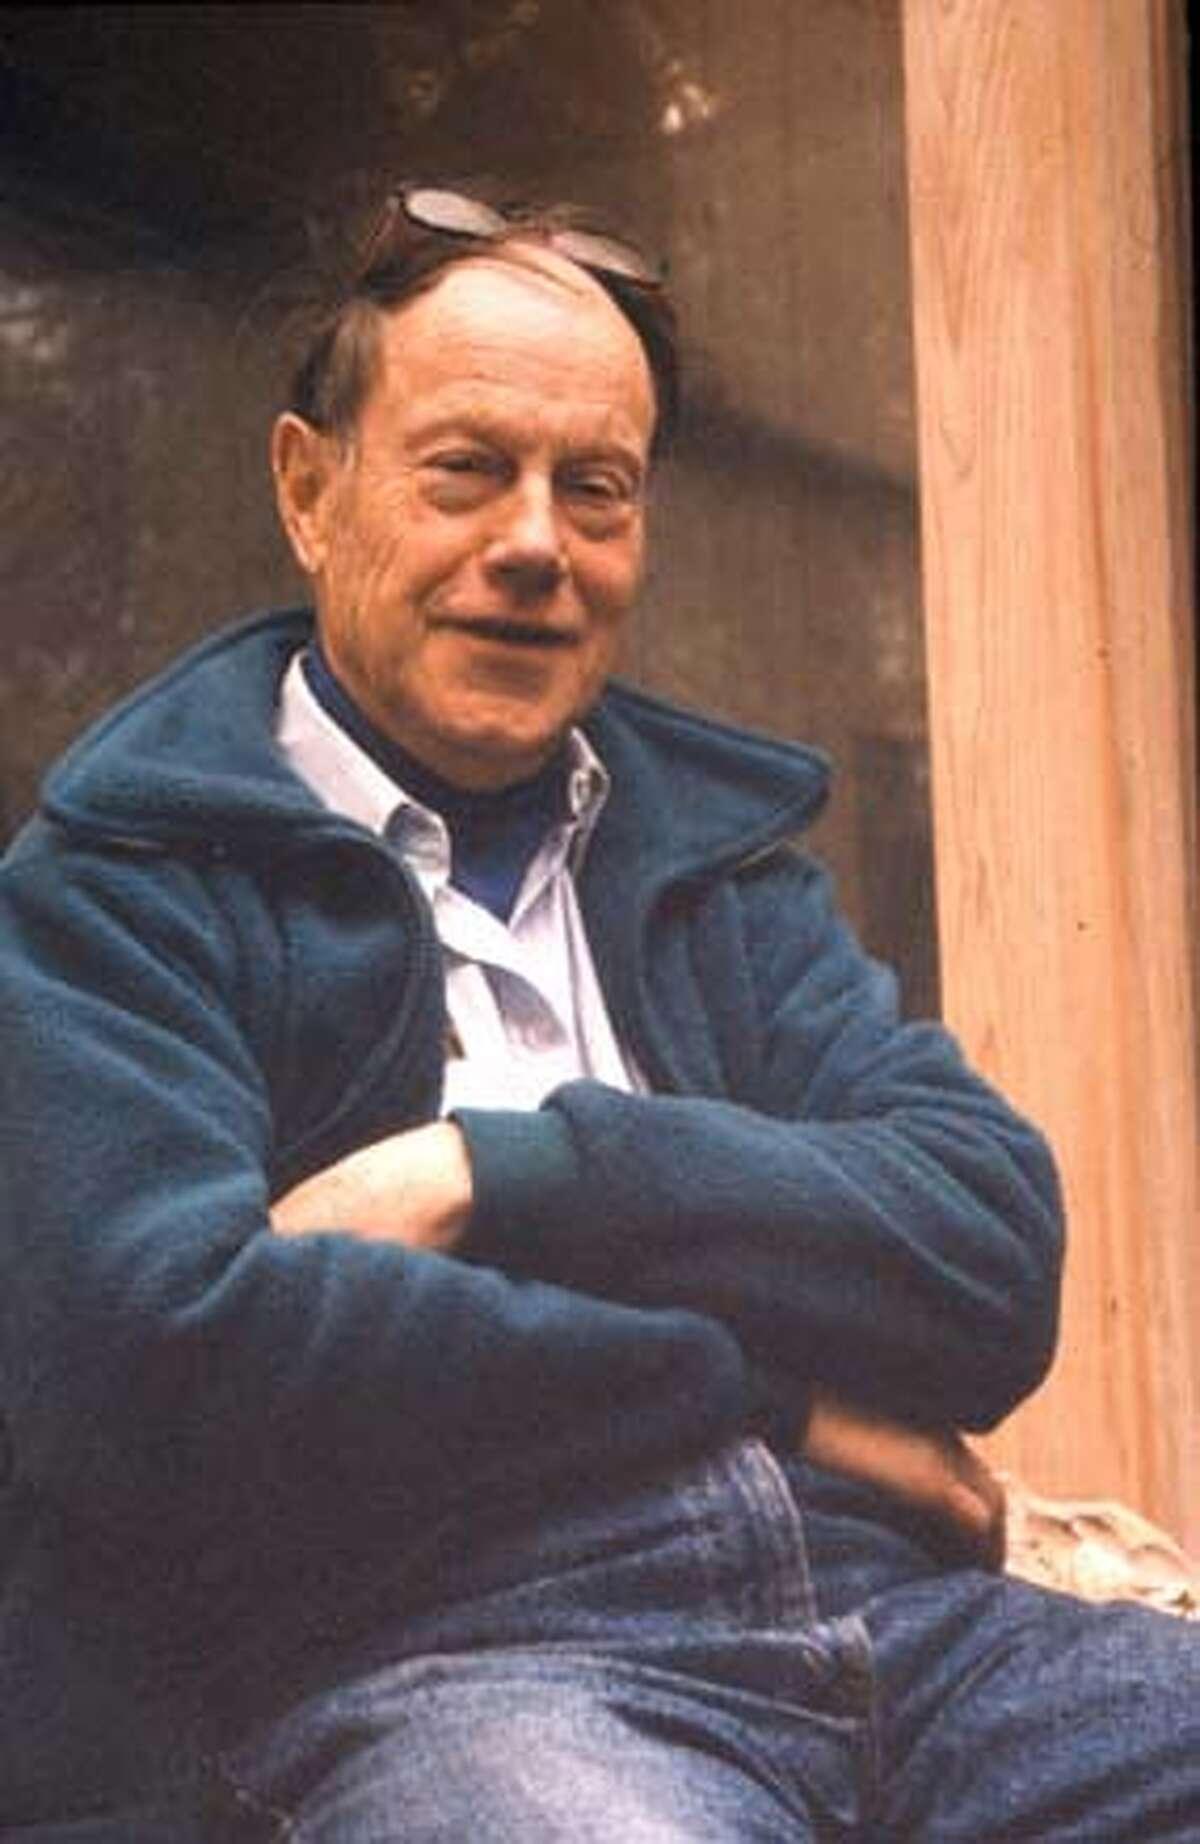 Philip Hyde photo taken in 1993